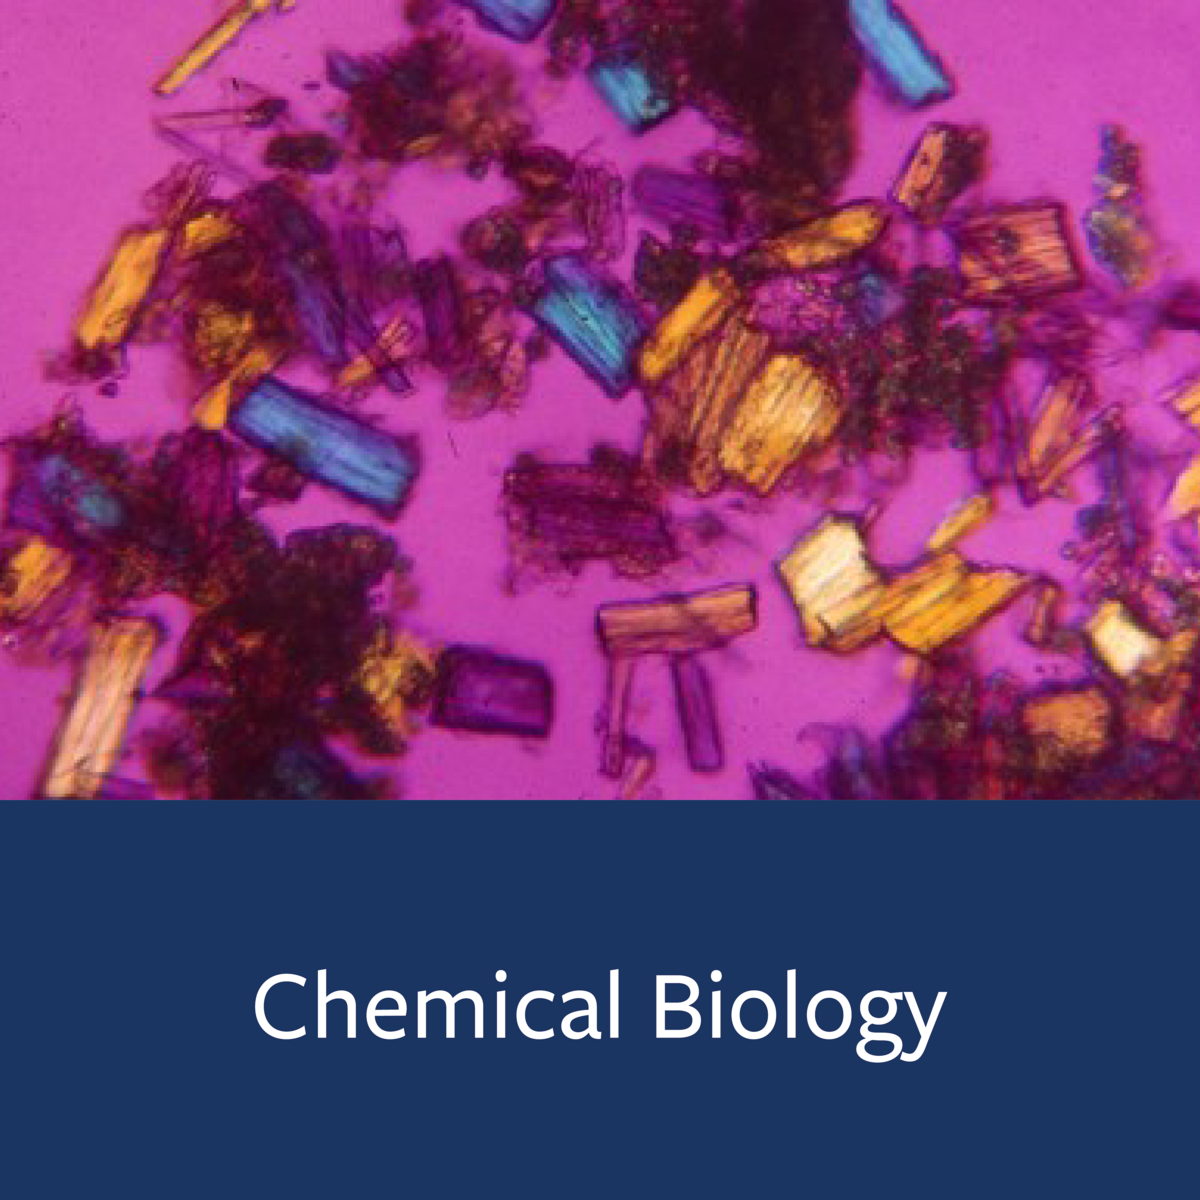 Chemical Biology Major Map